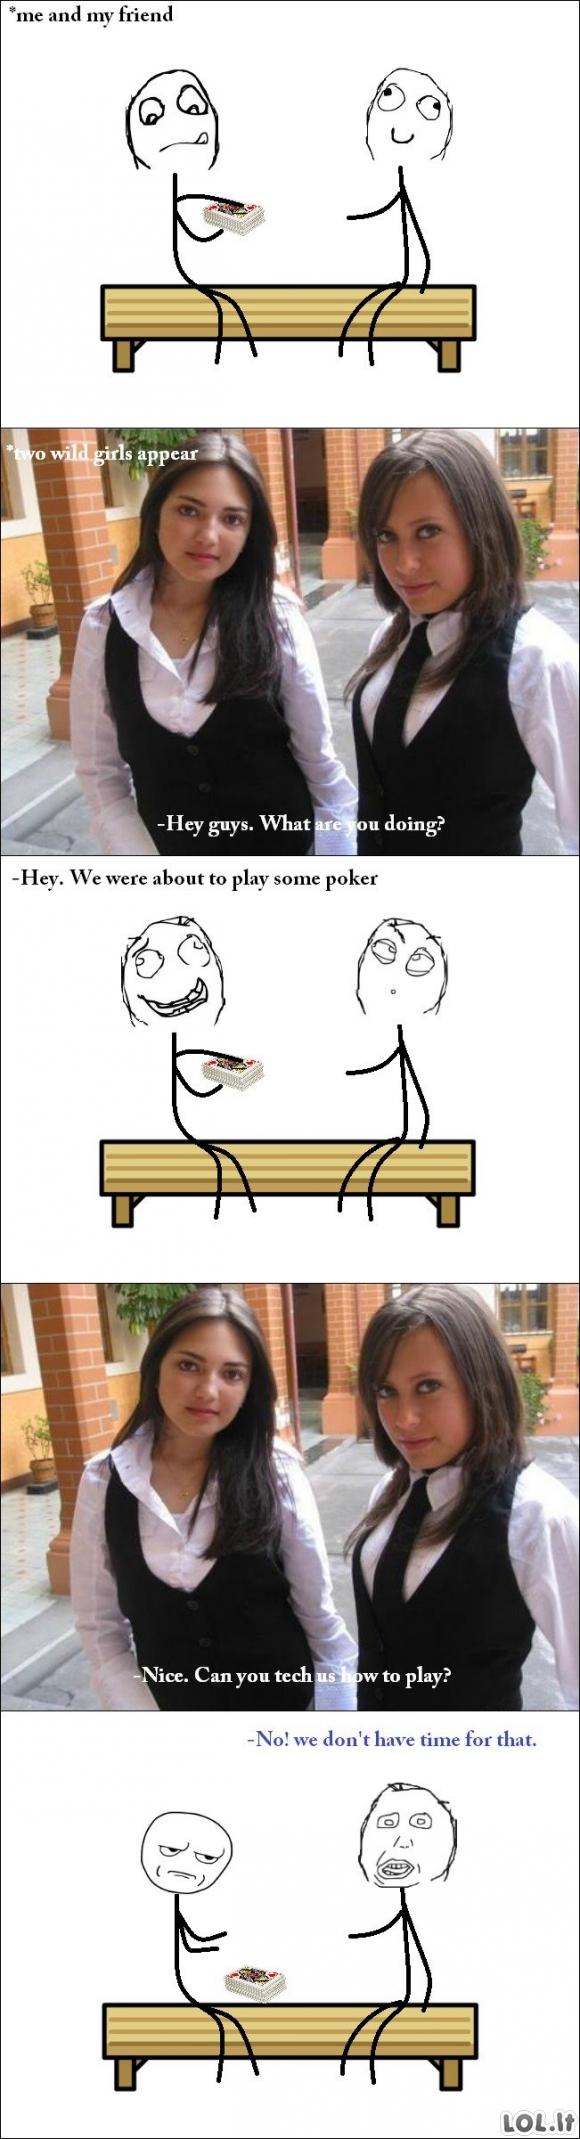 Pokerio merginos